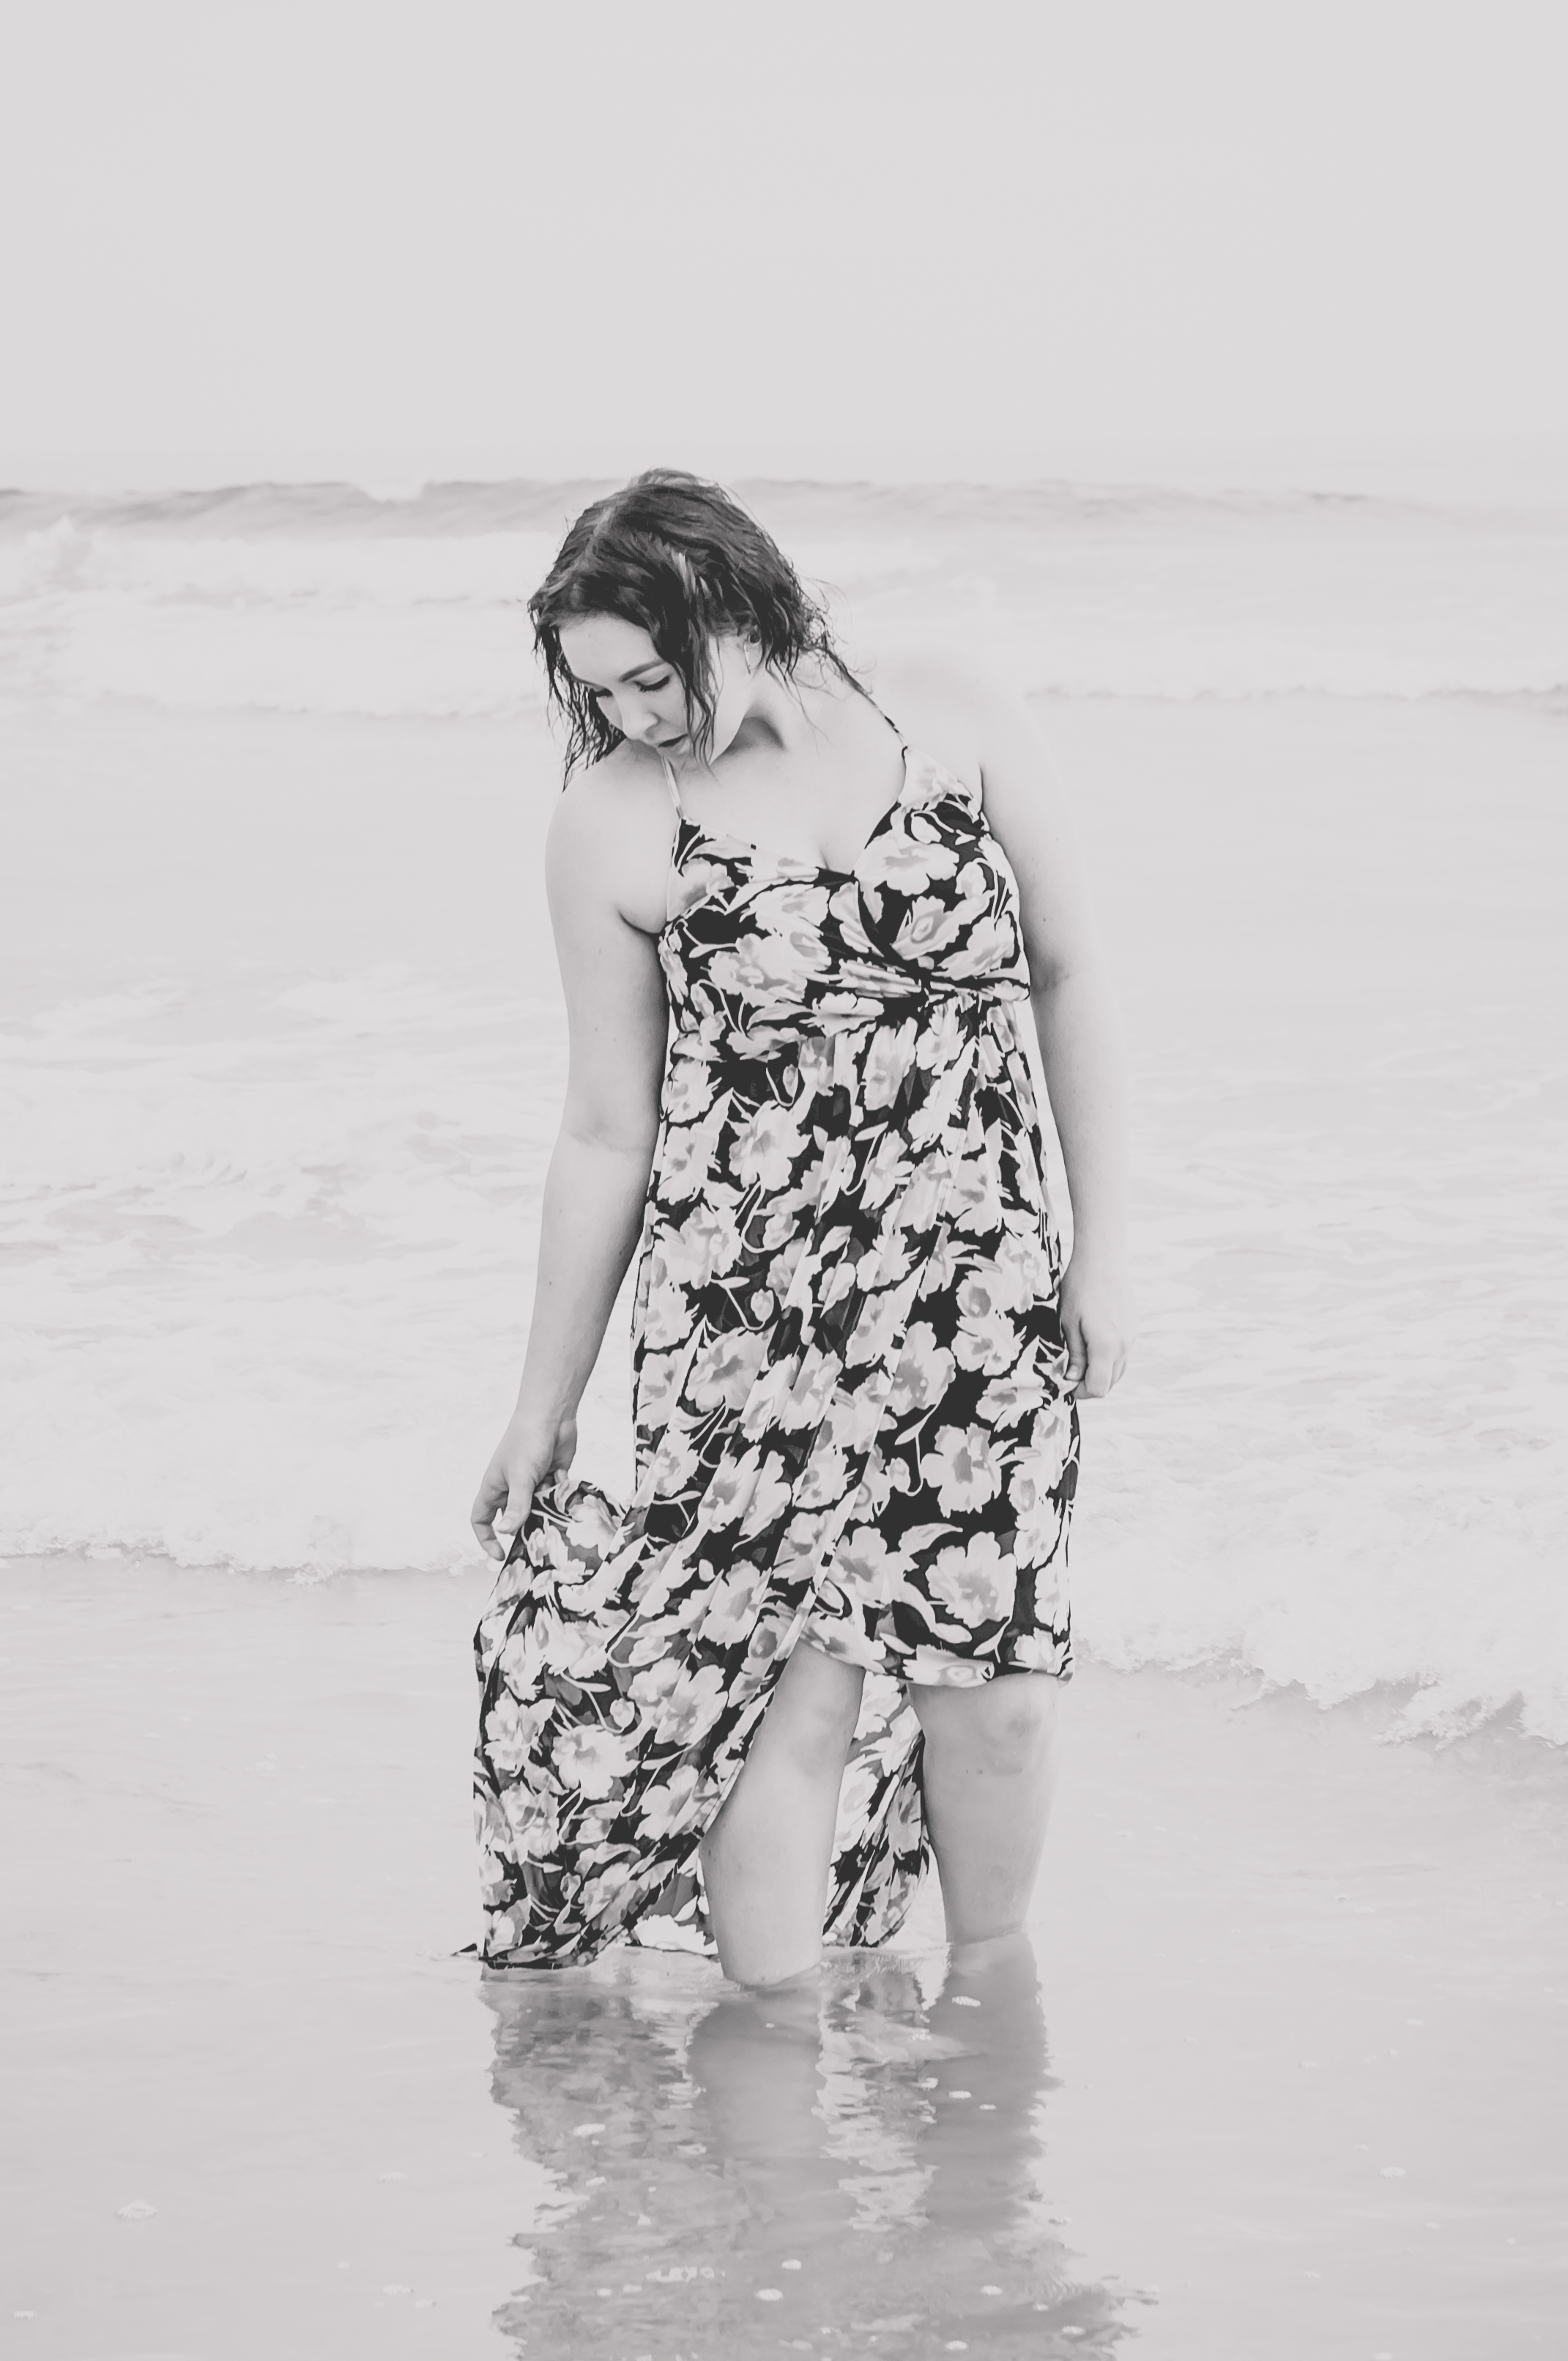 ponce-inlet-beach-senior-portrait-session-orlando-photographer-yanitza-ninett-1.jpg